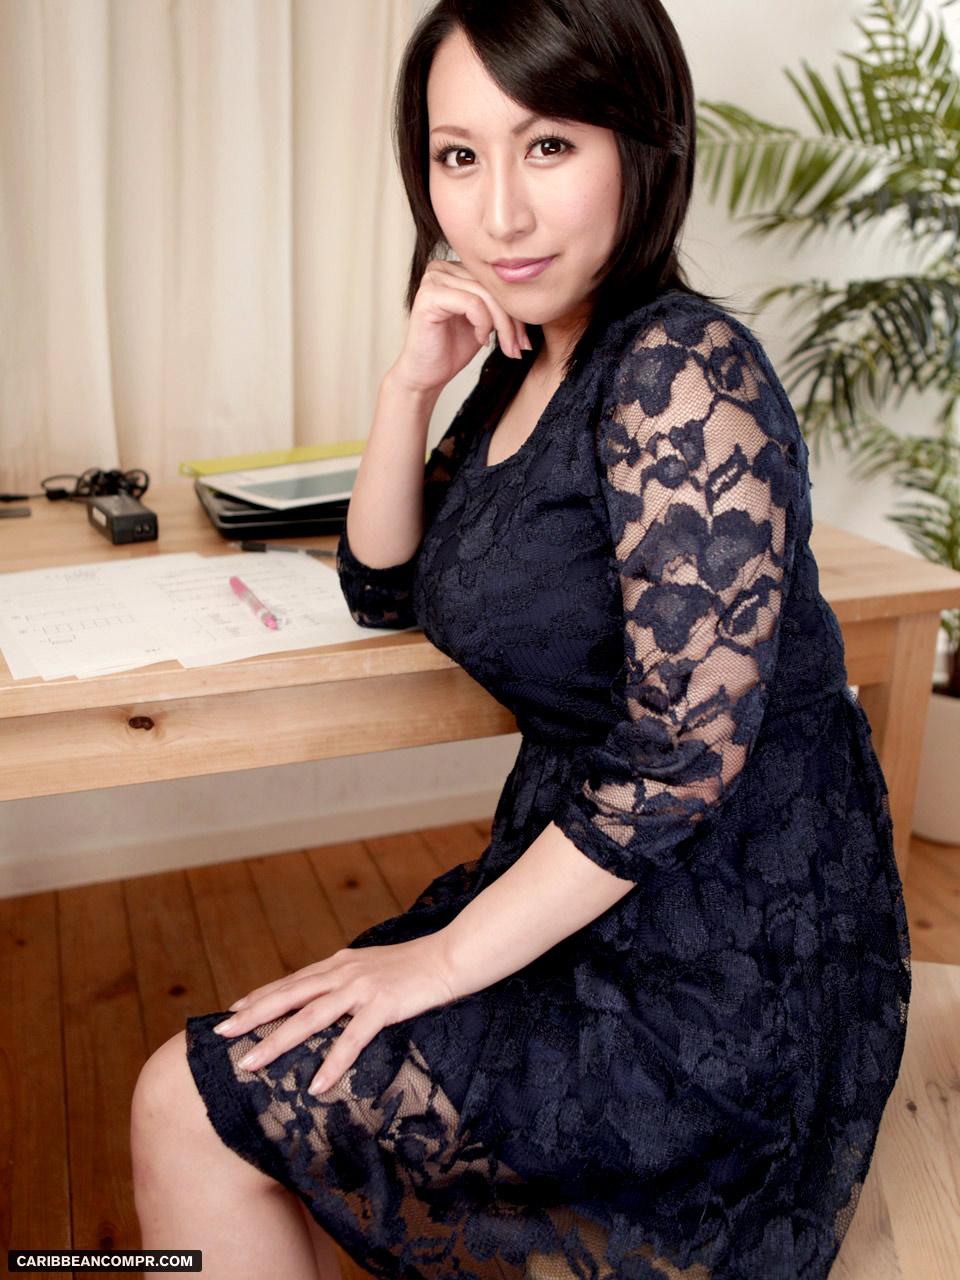 Hoshisaki yuuna